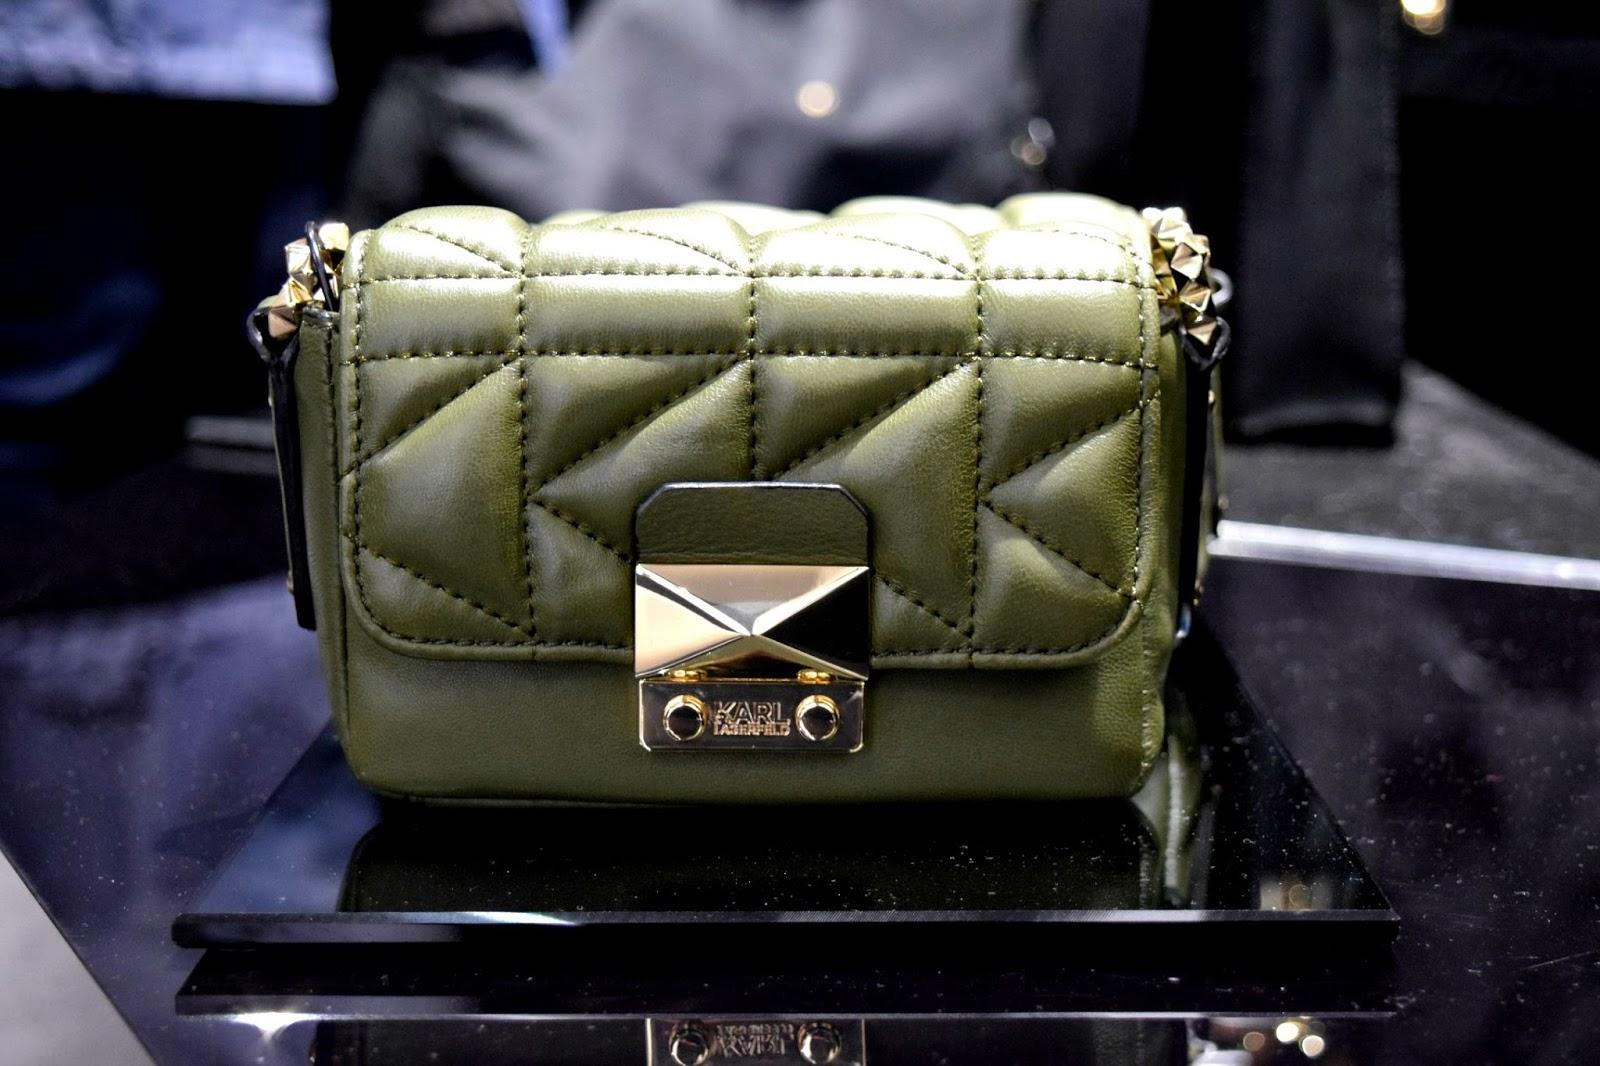 Karl Lagerfeld mini handbag